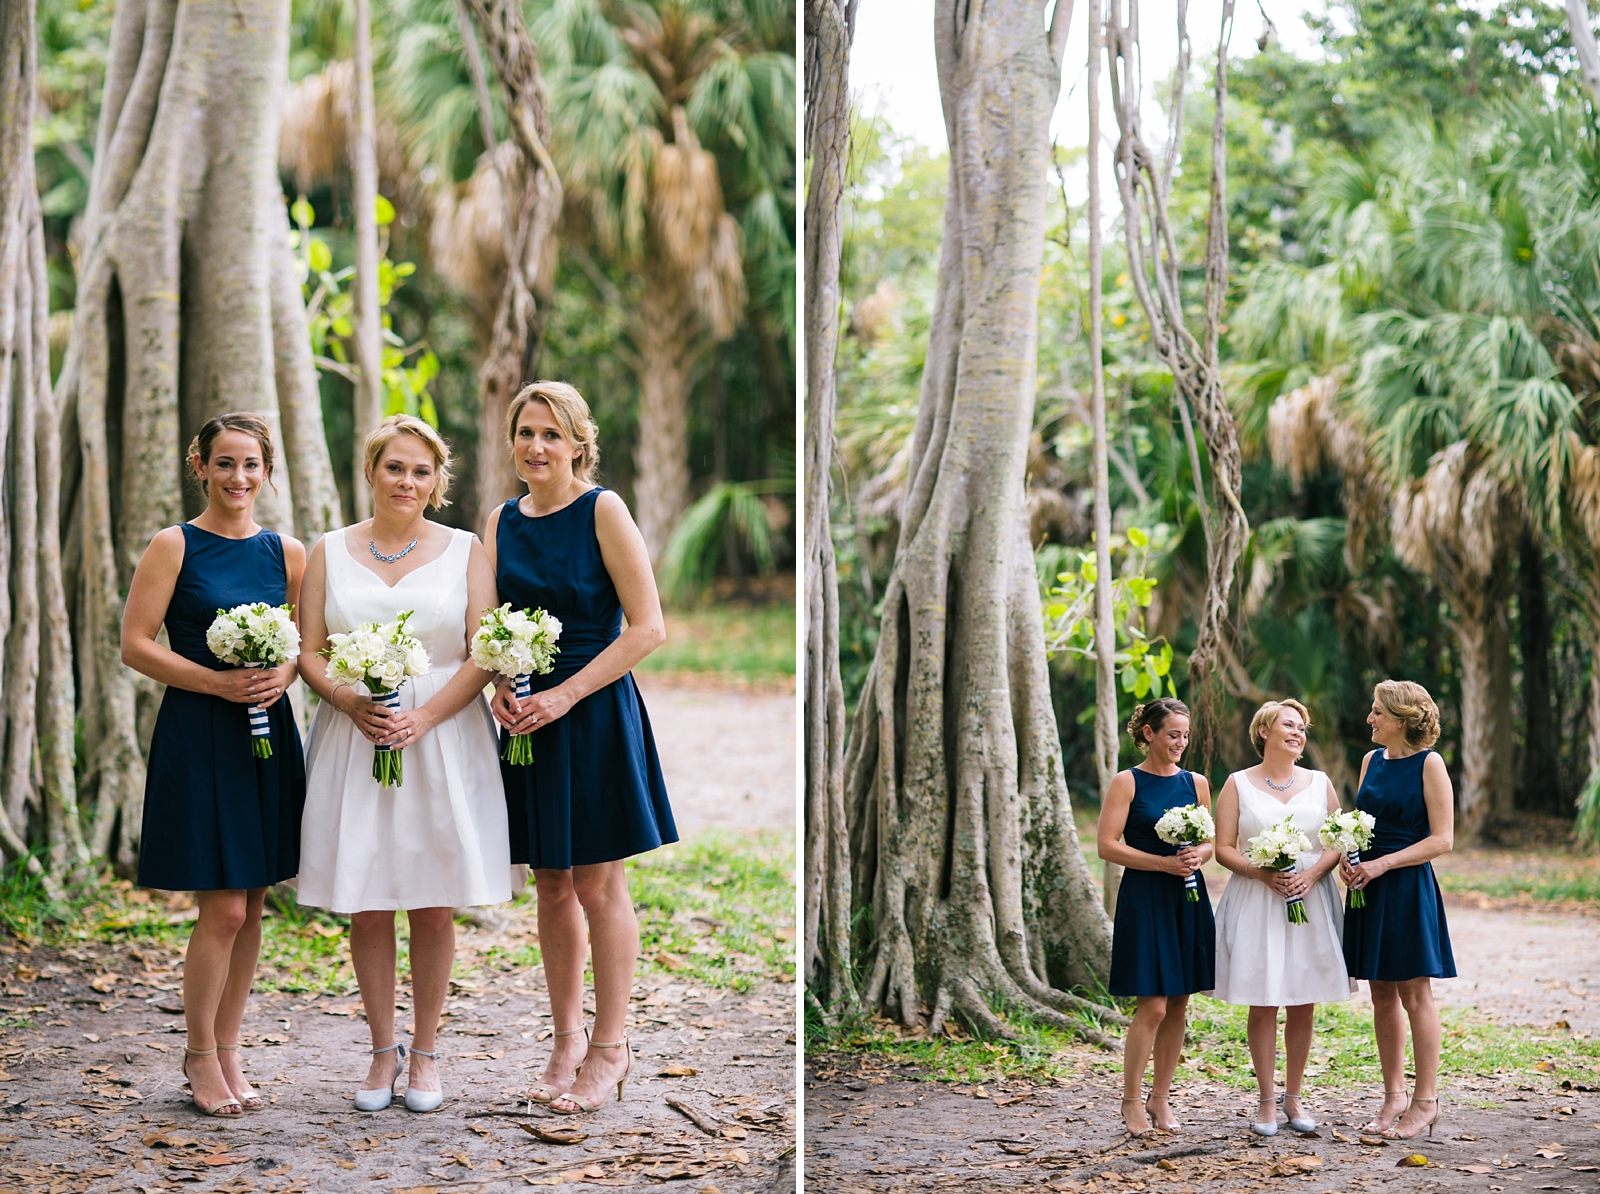 10-los-angeles-wedding-photographer-fort-lauderdale.jpg